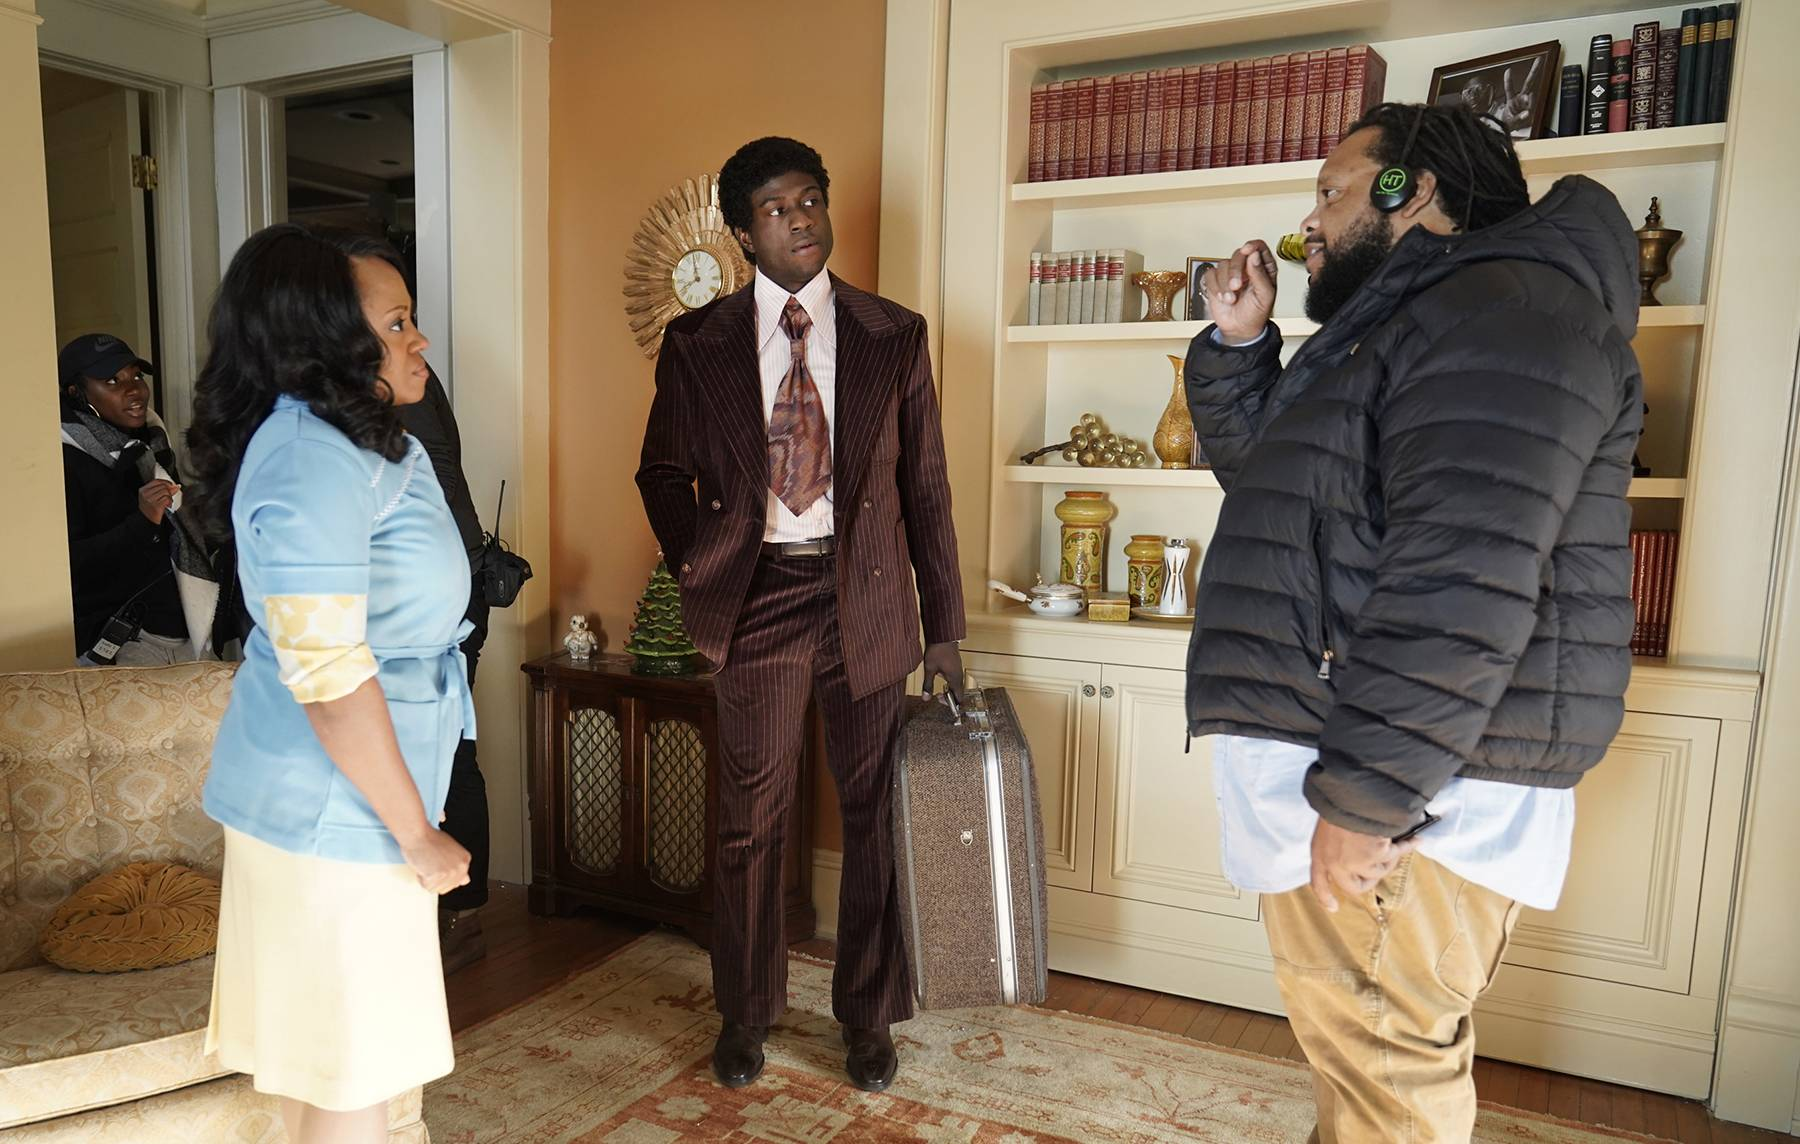 A Man With A Plan - Perri? Camper as Delores Cornelius, Sinqua Walls as Don Cornelius, and director Chris Robinson.